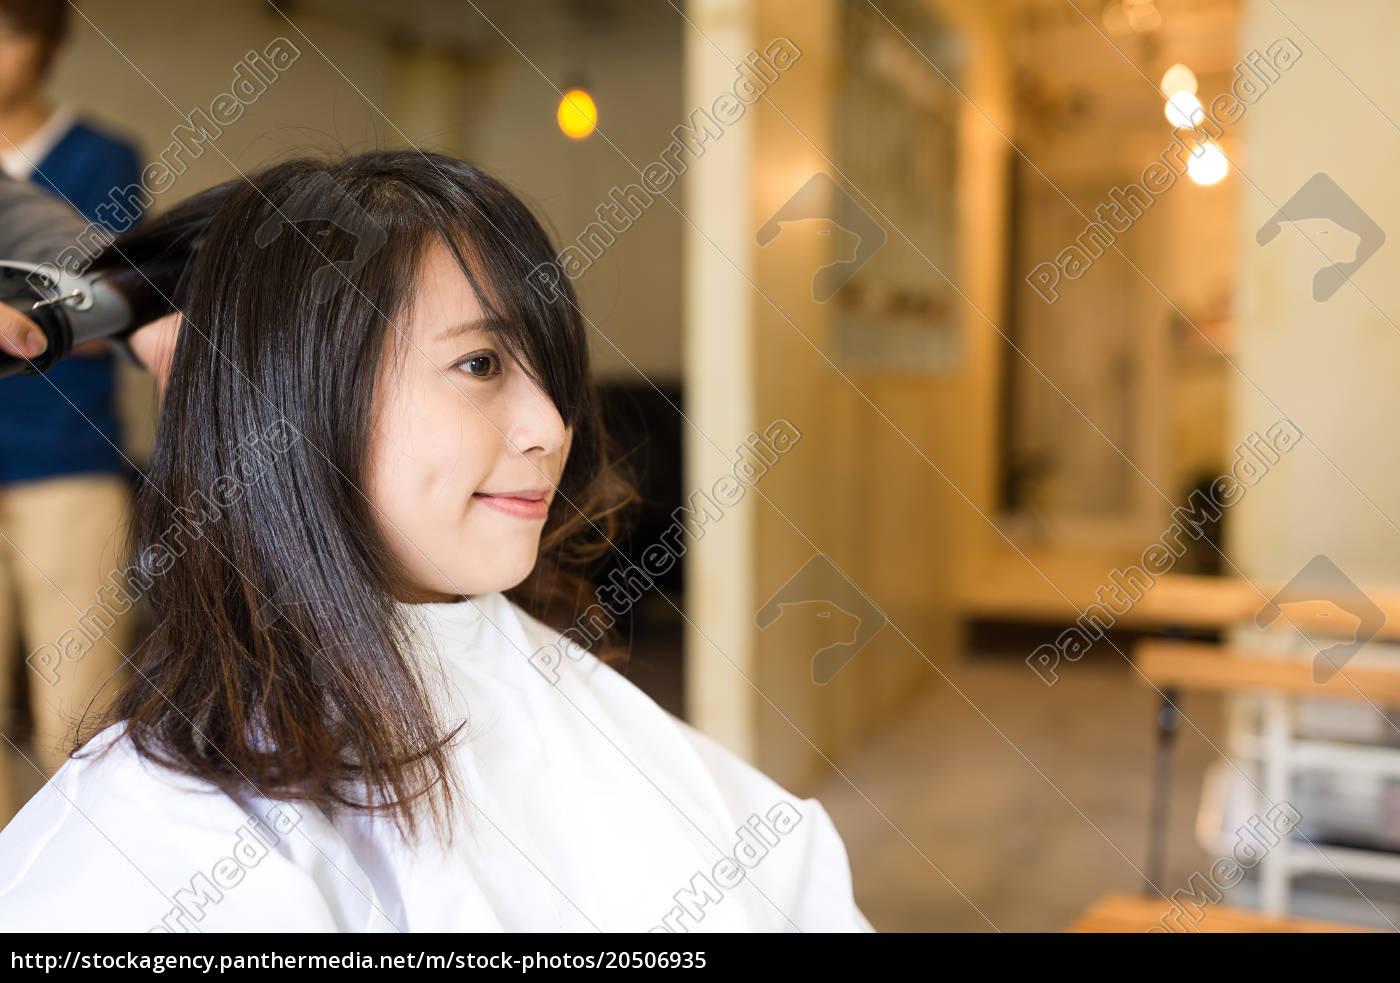 woman, getting, a, new, haircut - 20506935